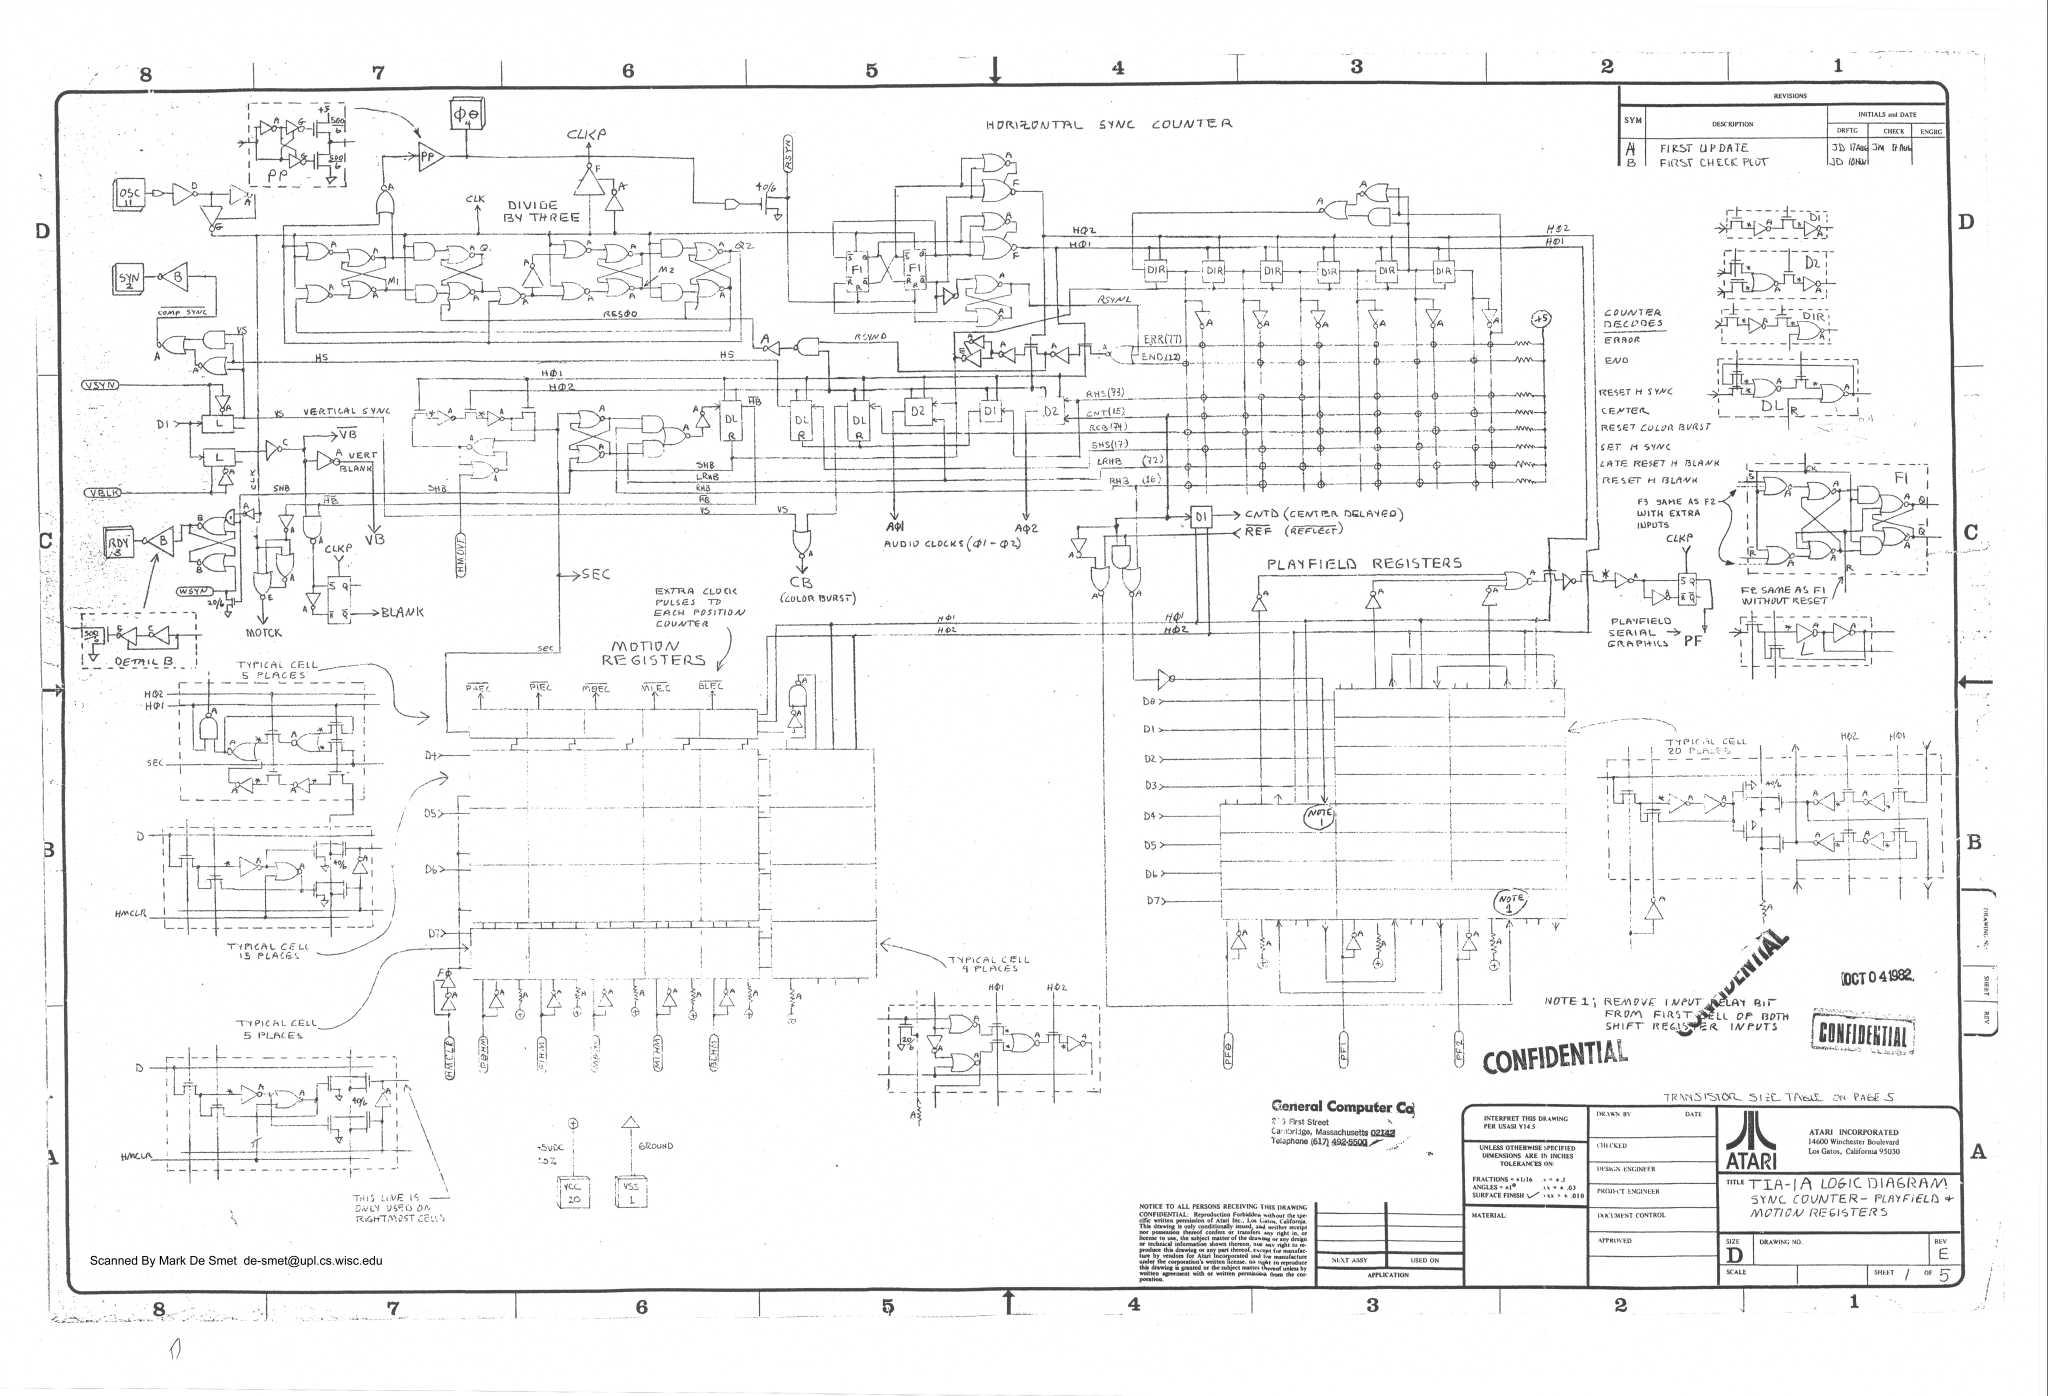 Mikrokomputer cobra 1 12 elektroda mikrokomputer cobra 1 mikrokomputer cobra 1 ccuart Gallery